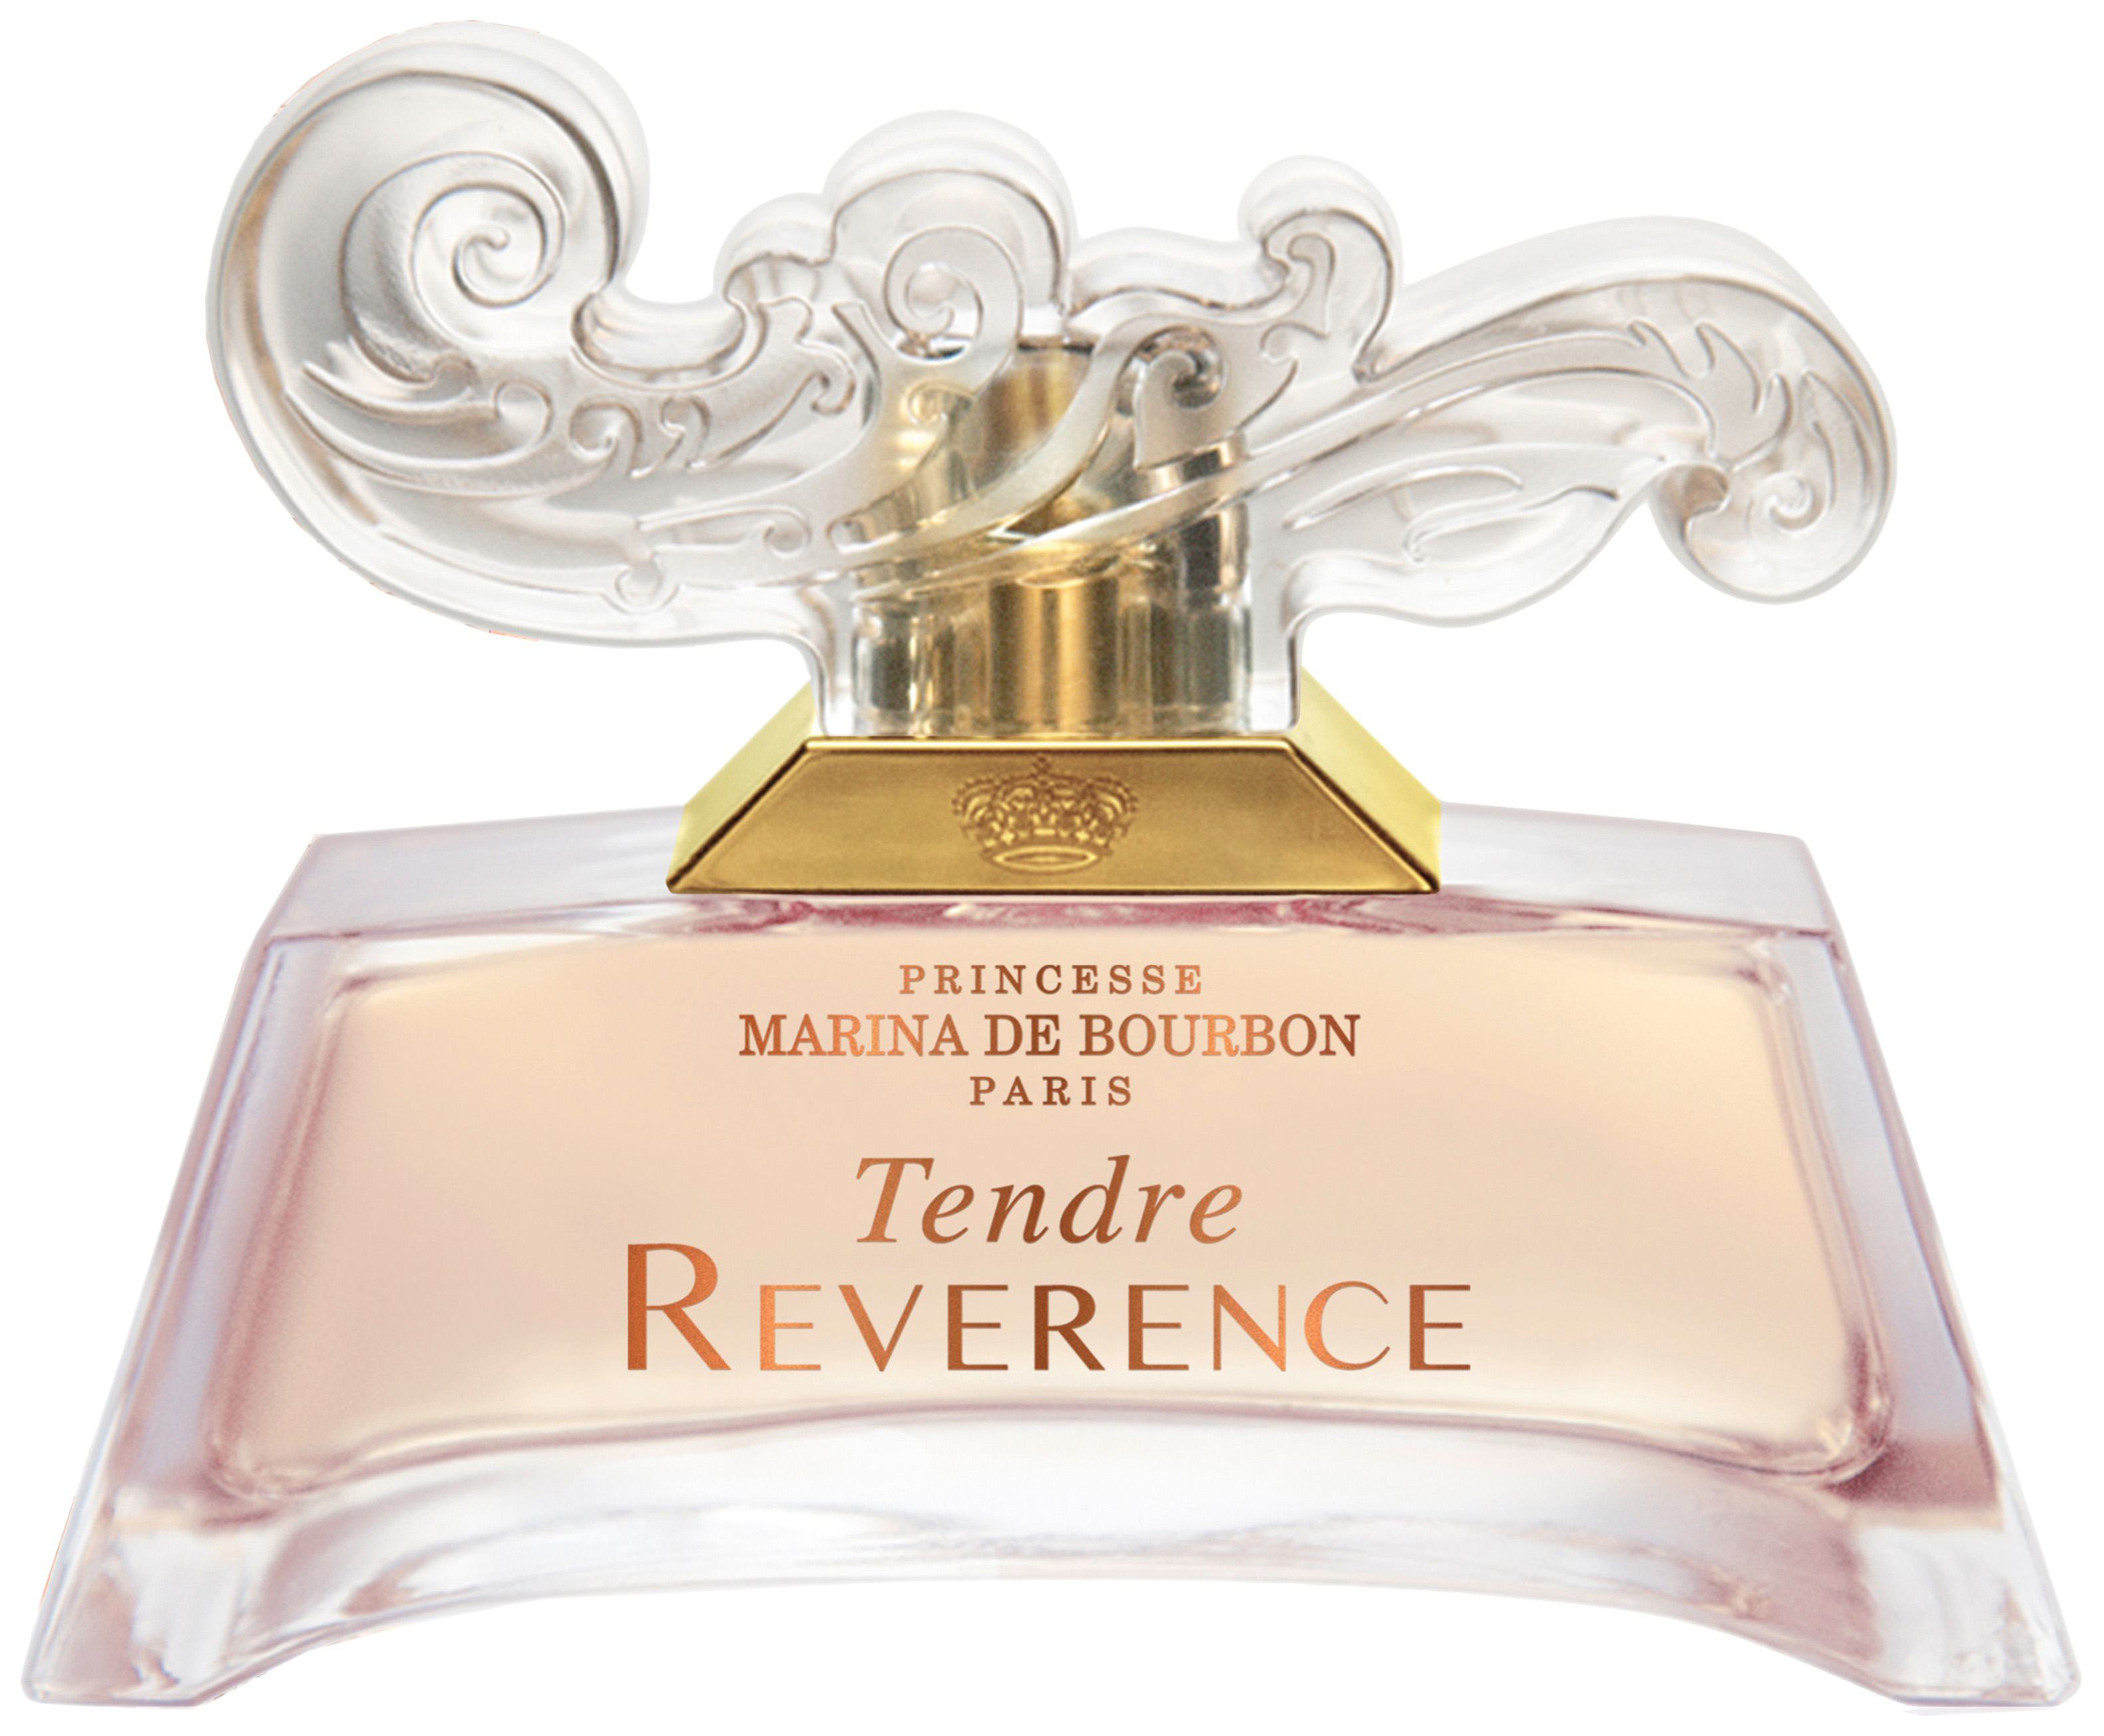 Купить Парфюмерная вода Marina de Bourbon Tendre Reverence 2014 7, 5 мл